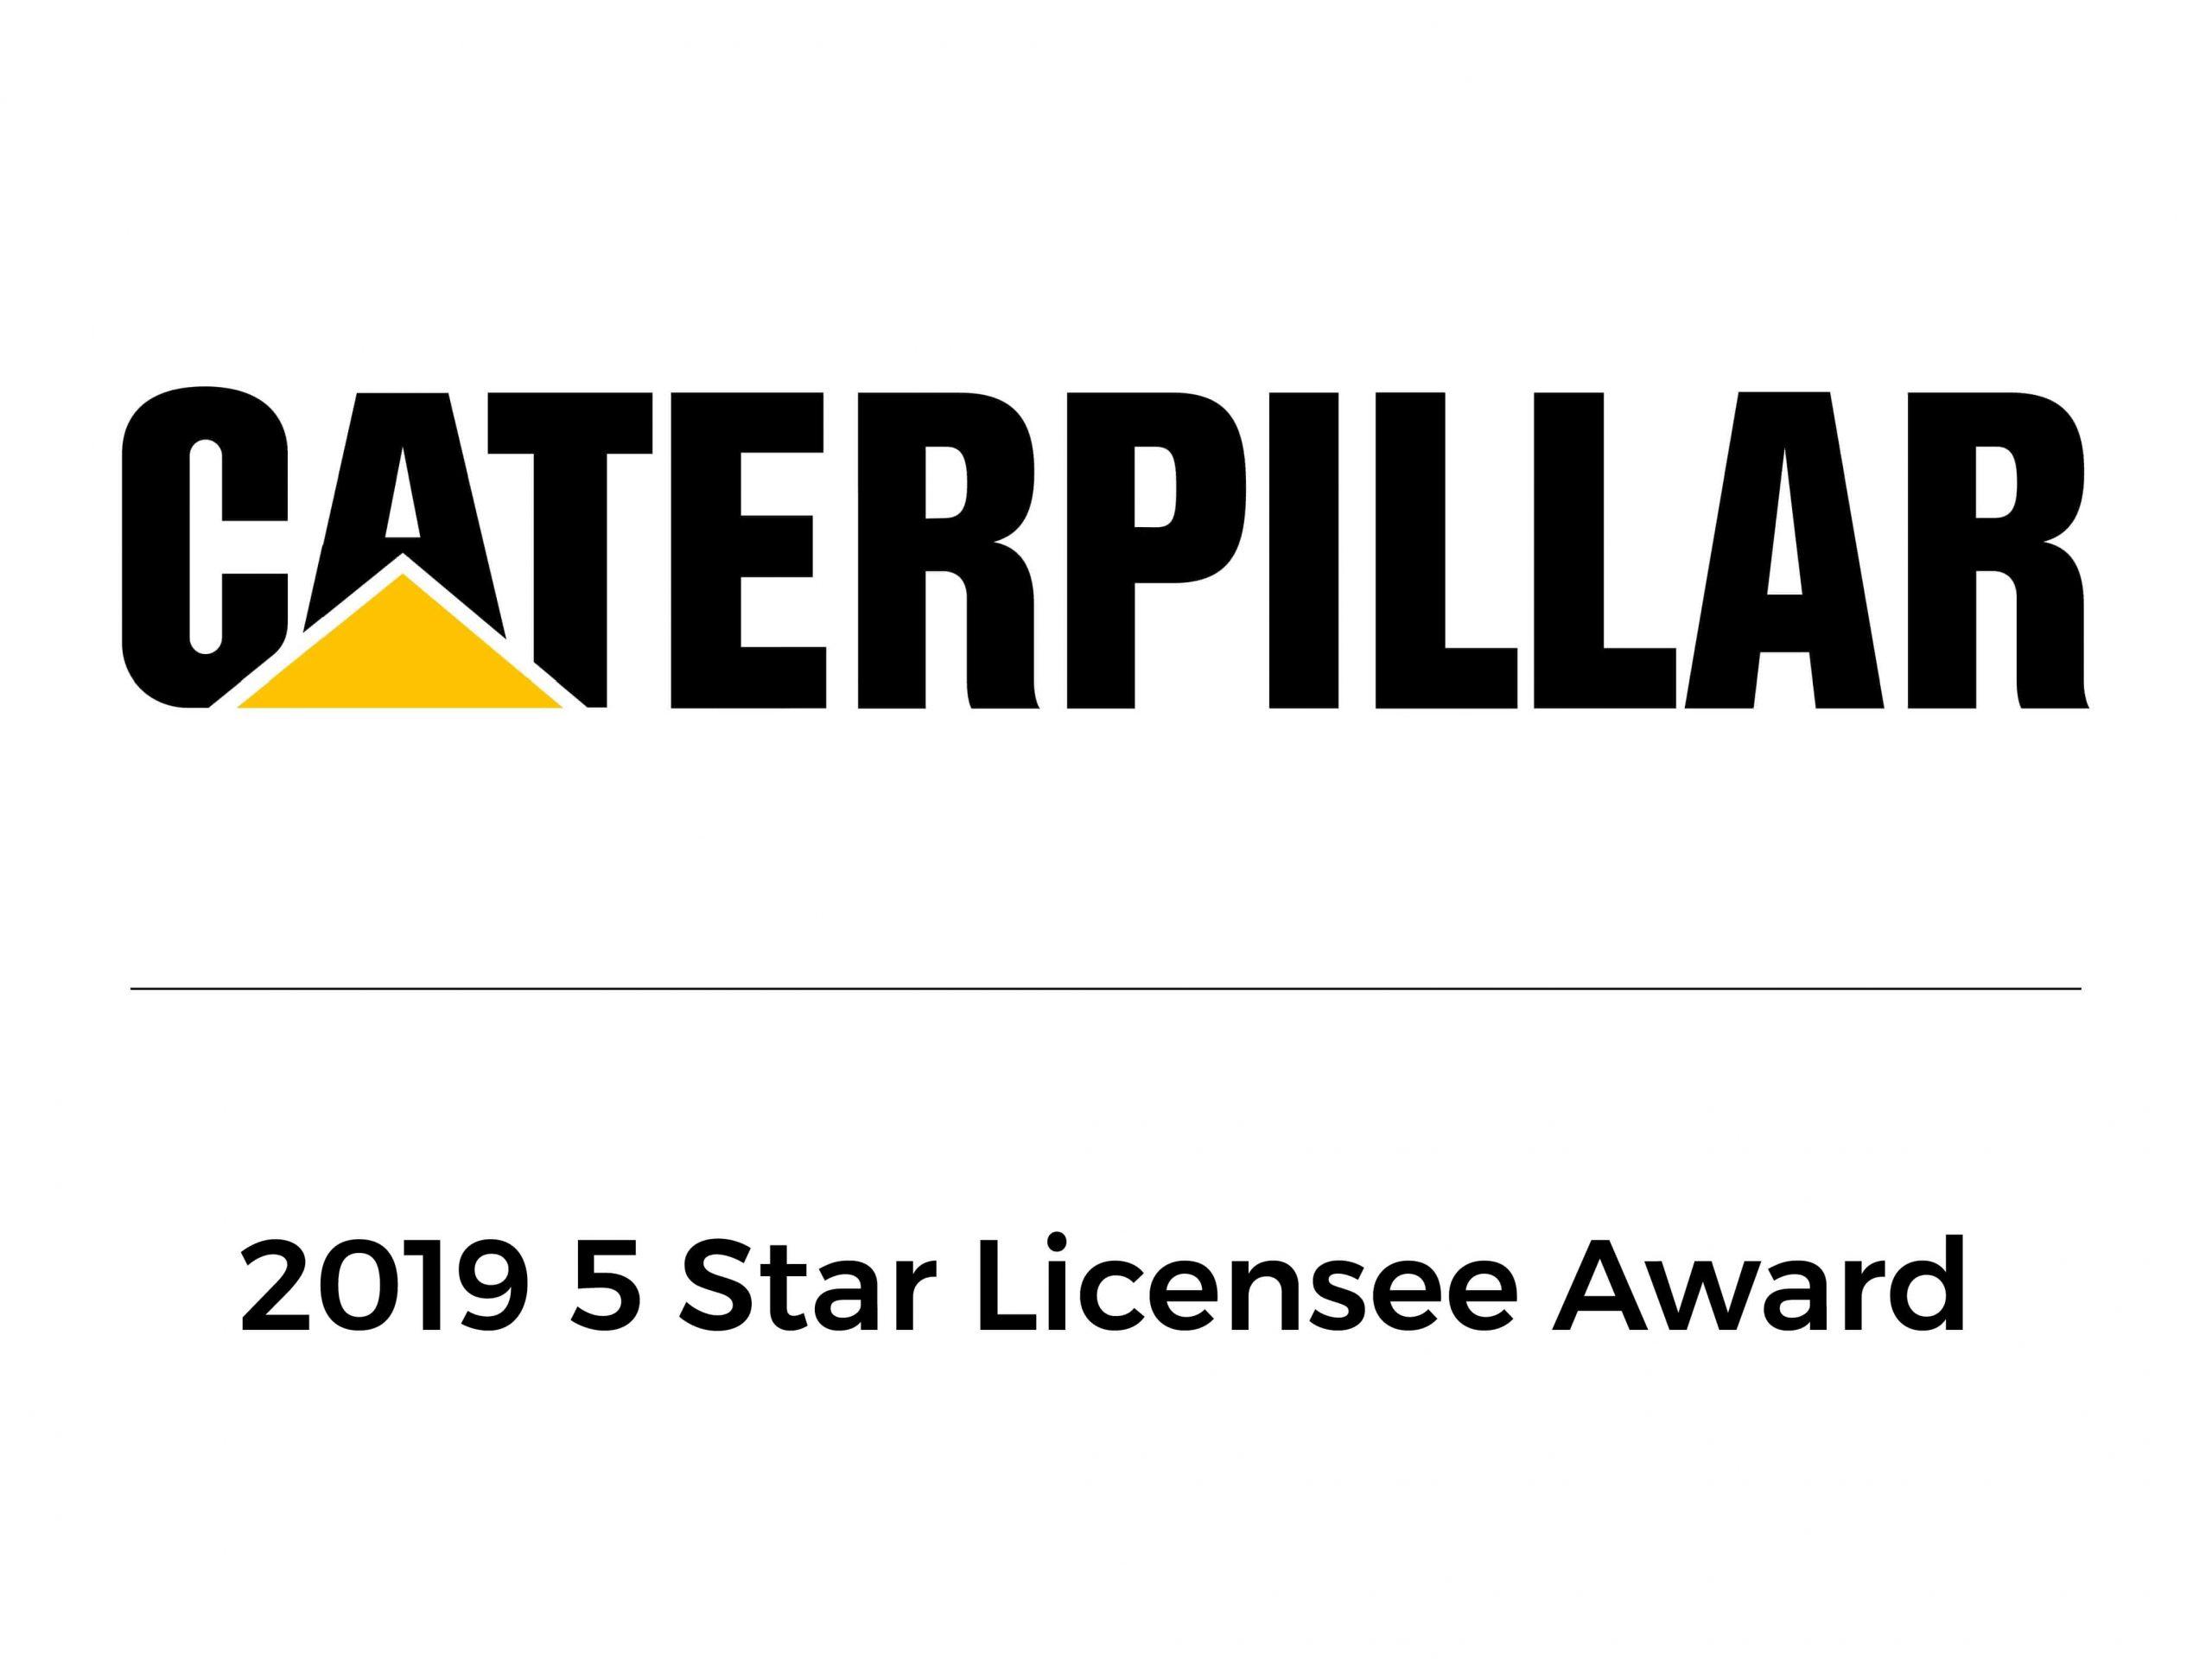 Caterpillar 2019 5 Star Licensee Award